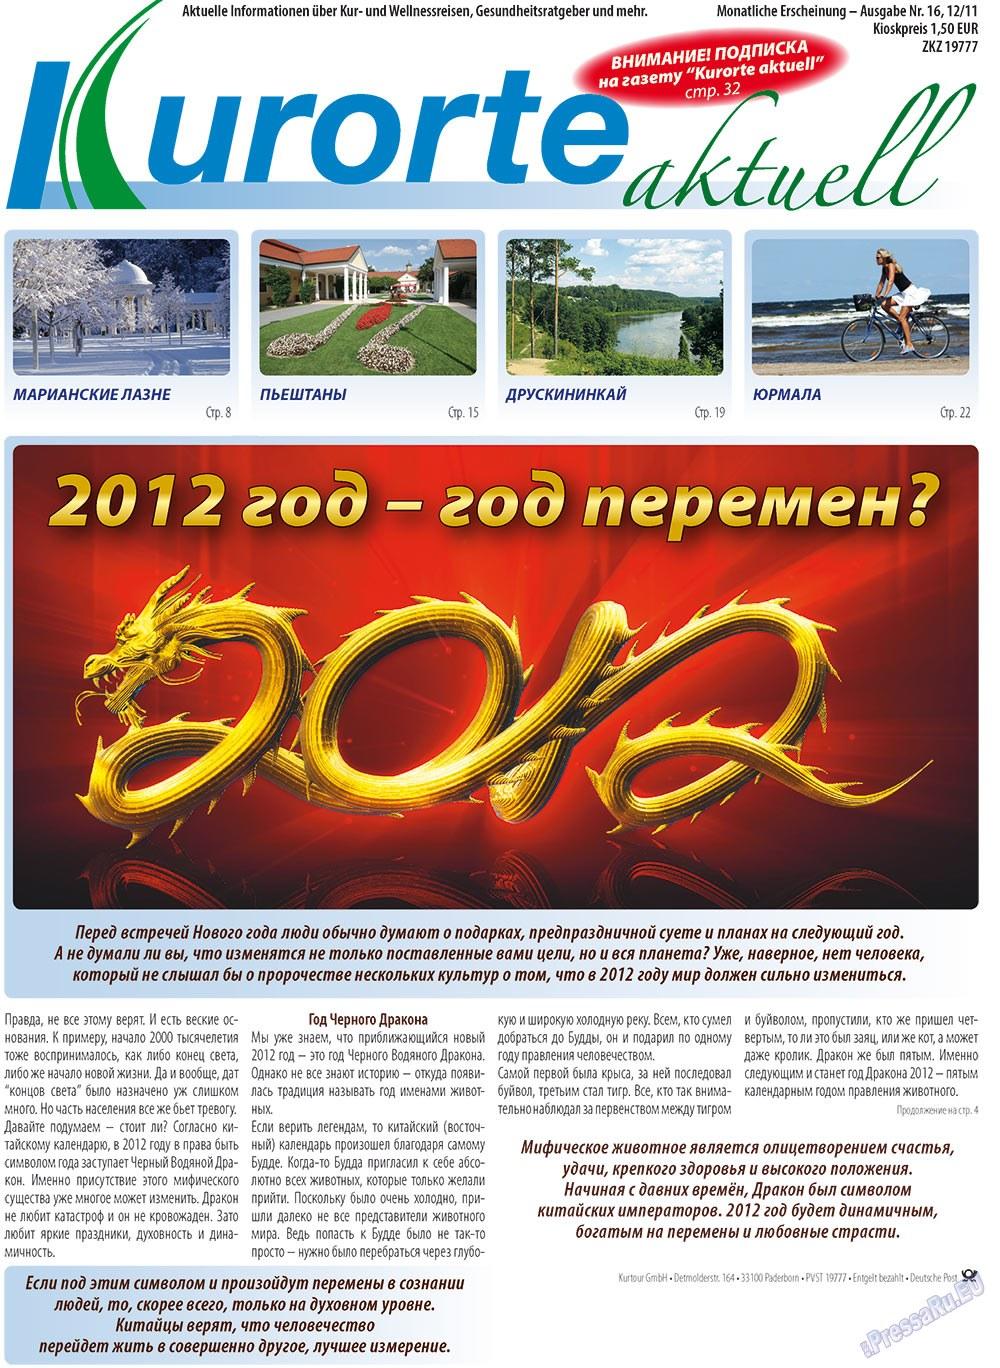 Kurorte aktuell (газета). 2011 год, номер 12, стр. 1